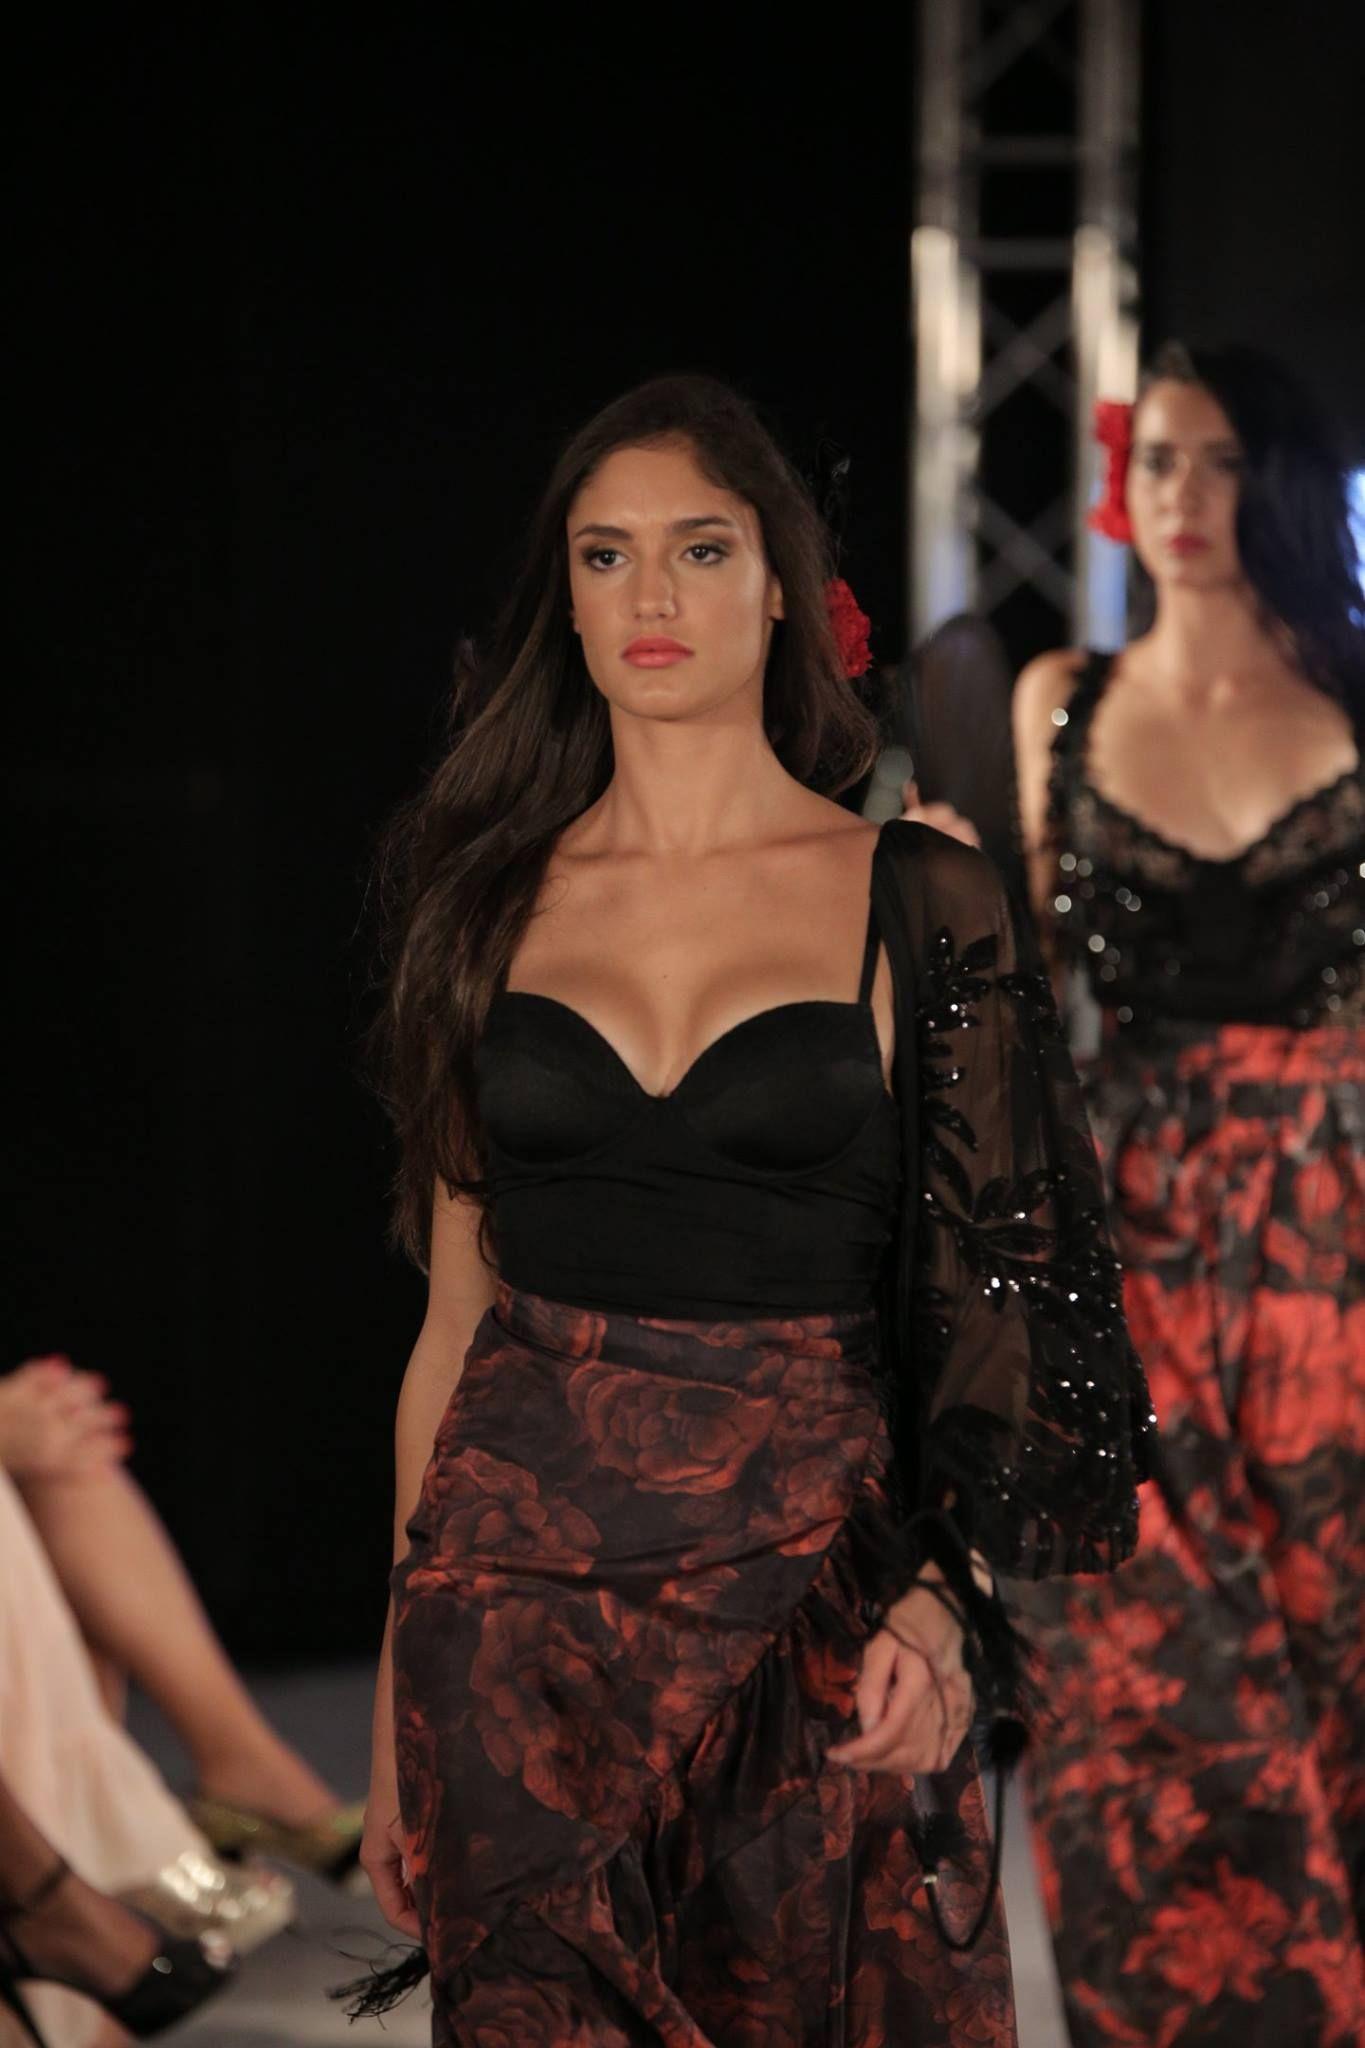 Agua na Boca Collection  Flamenco inspired by Daniela Poggi #fashionshow #luxe #dress